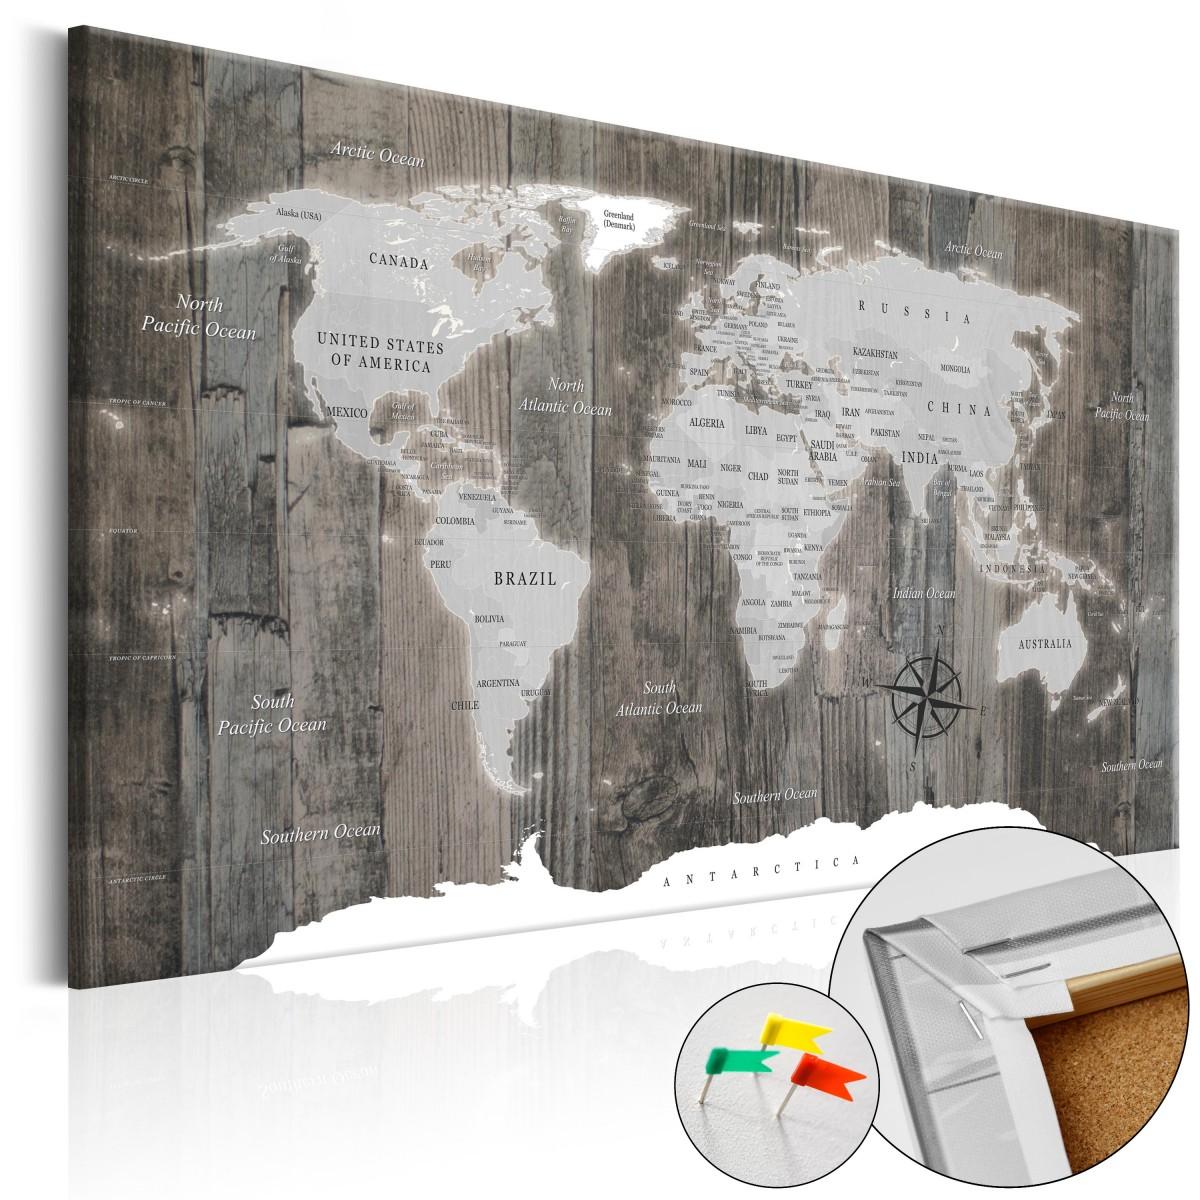 Mapa na korkové tabuli - dřevo 120x80 cm